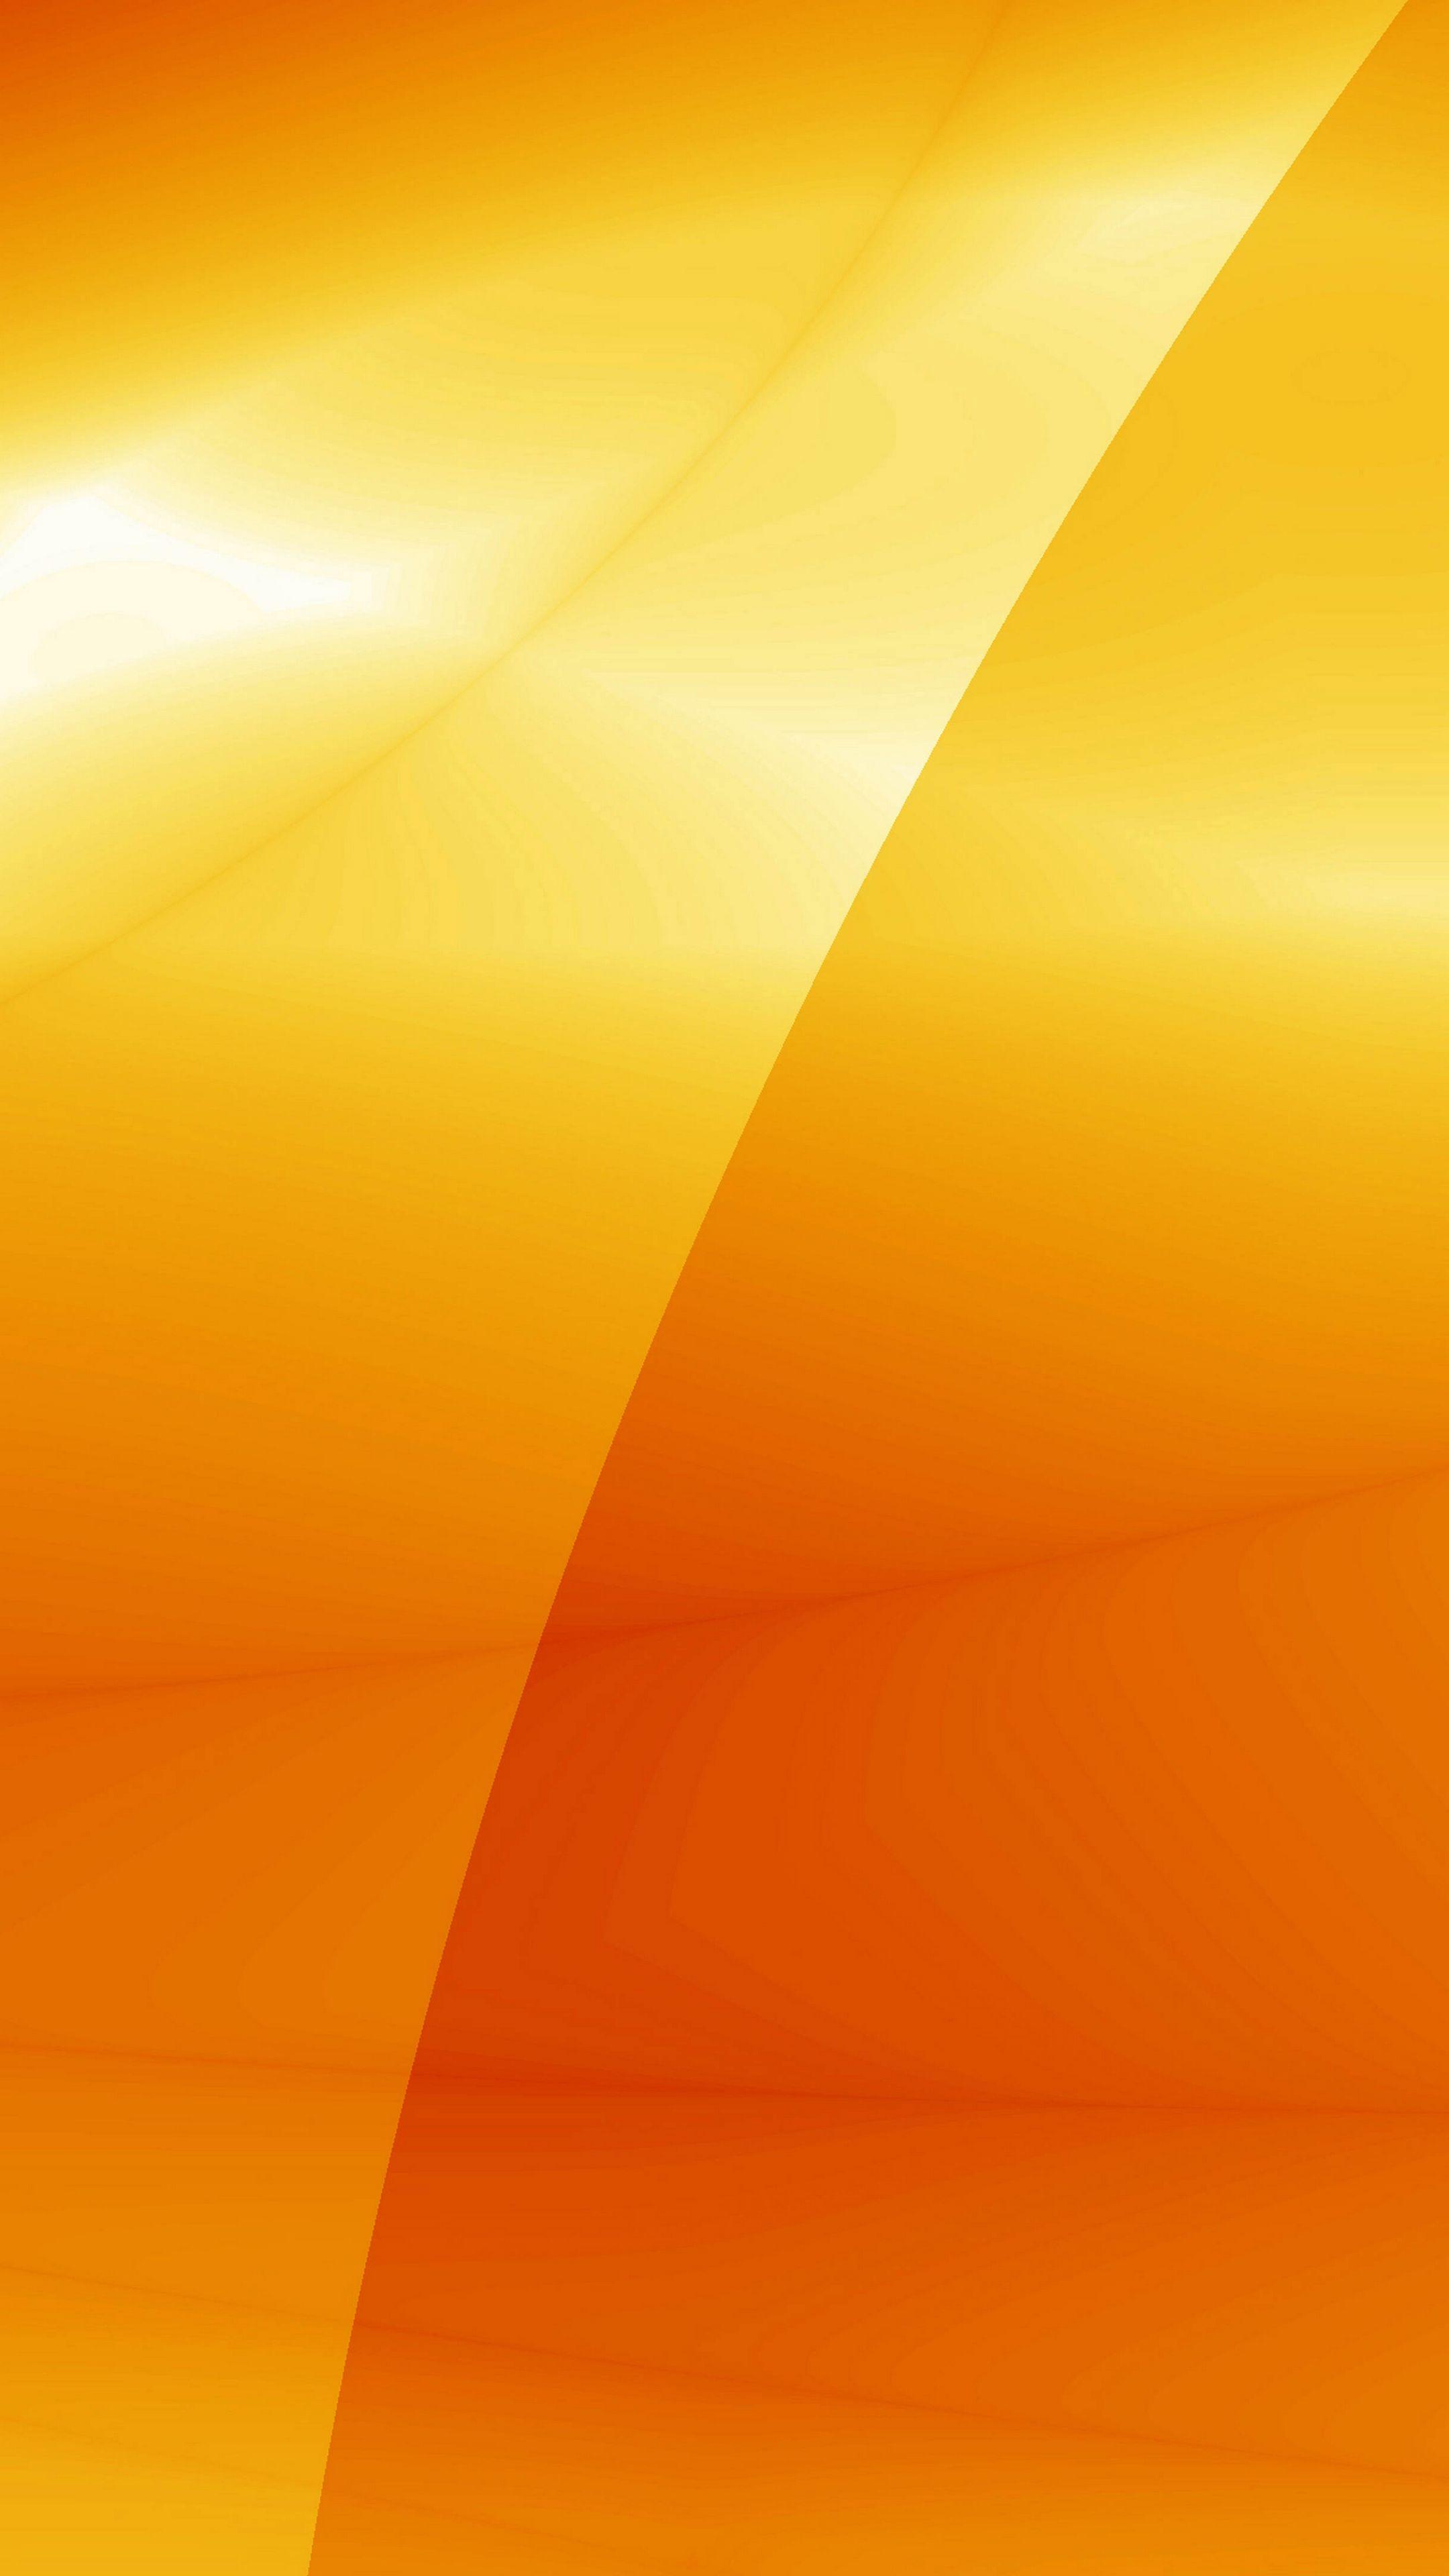 Abstract Wallpaper Abstract Wallpaper Abstract Iphone Wallpaper Abstract